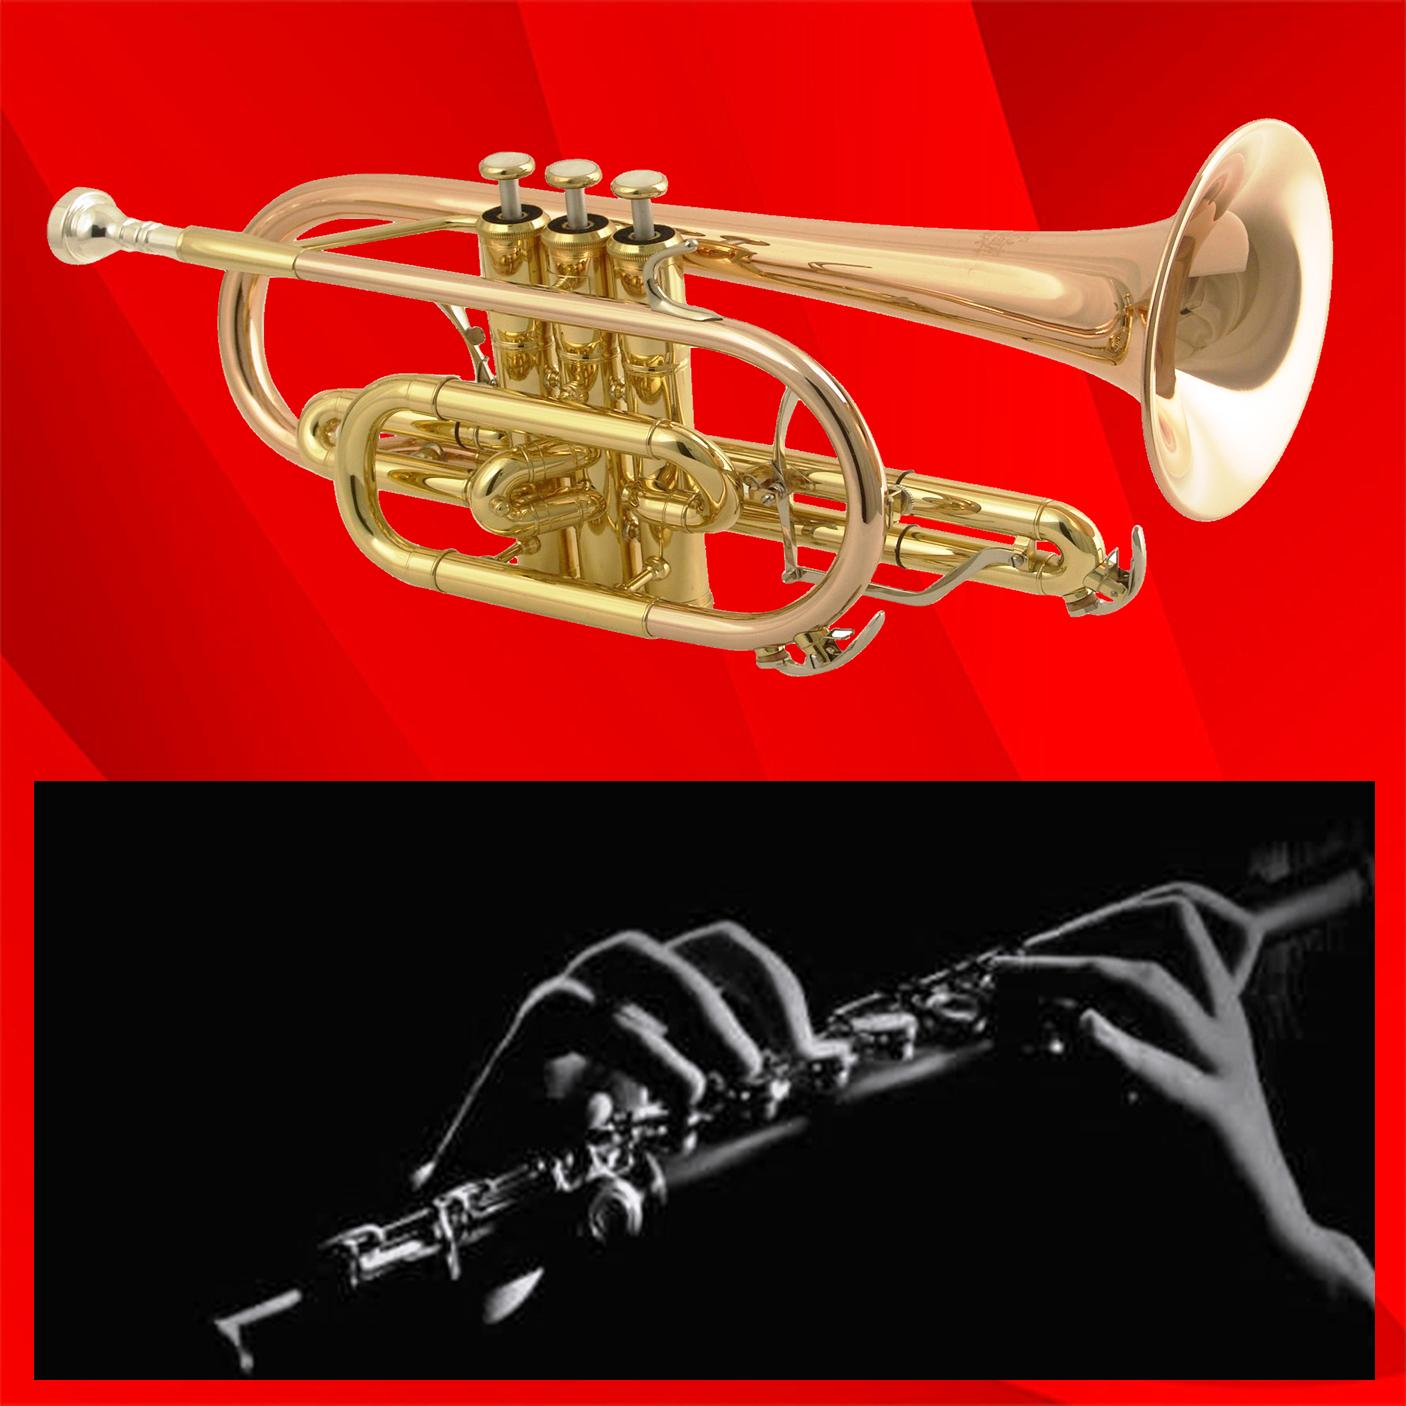 Kuğu Sanat Özel Konservatuvarda Flüt, Saksafon, Klarnet Trompet Dersleri